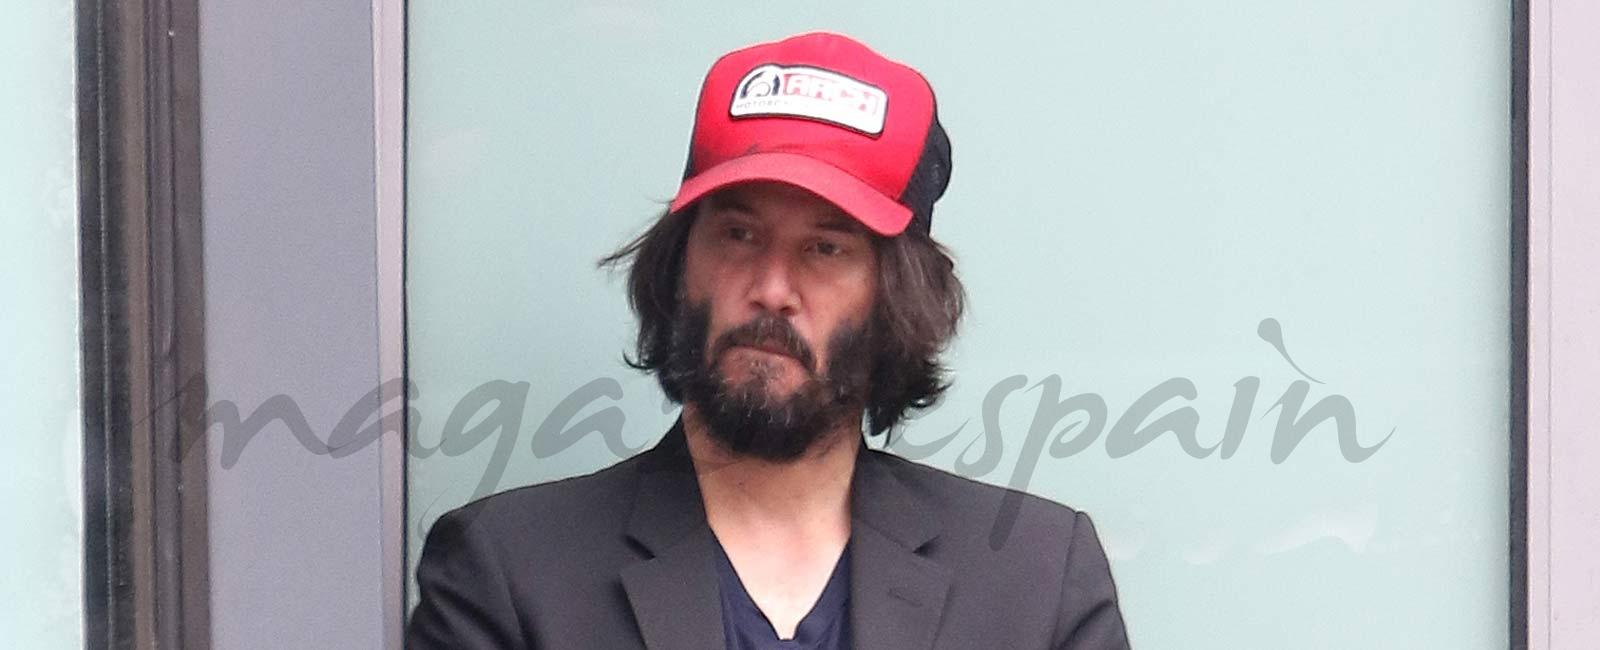 ¿Qué le pasa a Keanu Reeves?